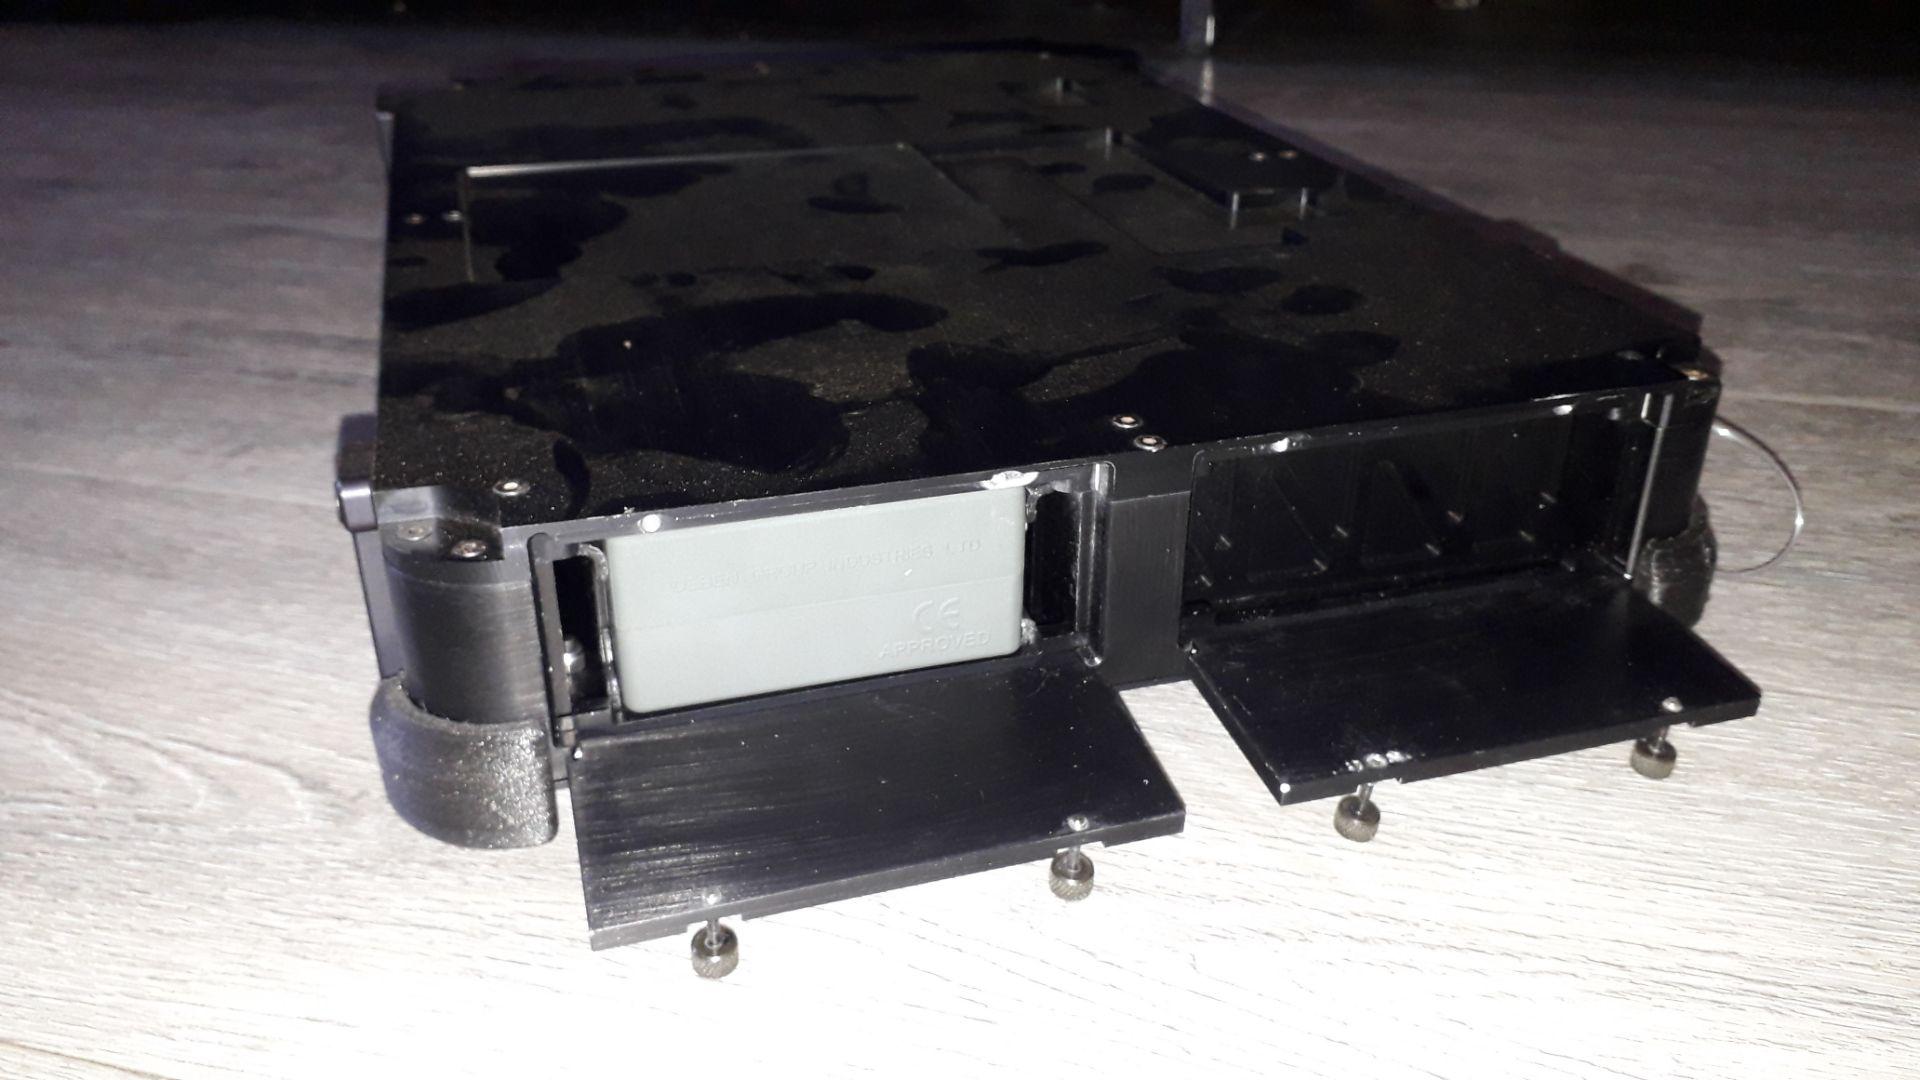 Unbranded Docking Bay for Getac X500 Ultra Rugged - Image 2 of 7